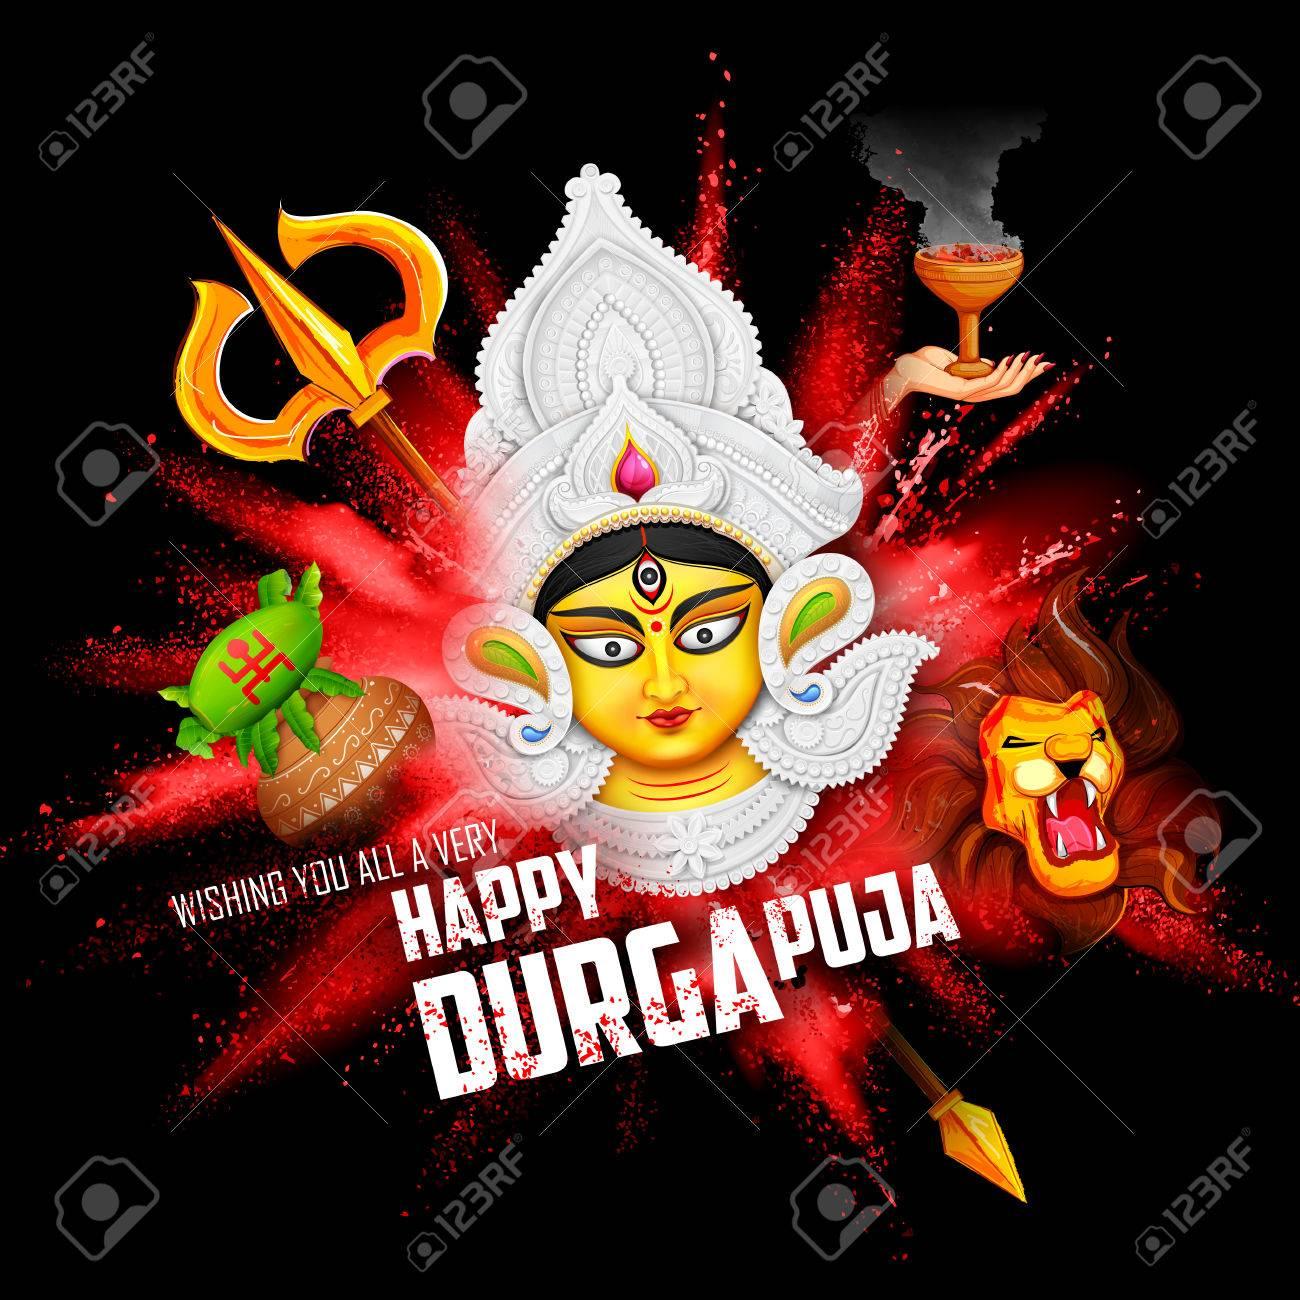 Illustration Of Goddess Durga In Subho Bijoya Happy Dussehra